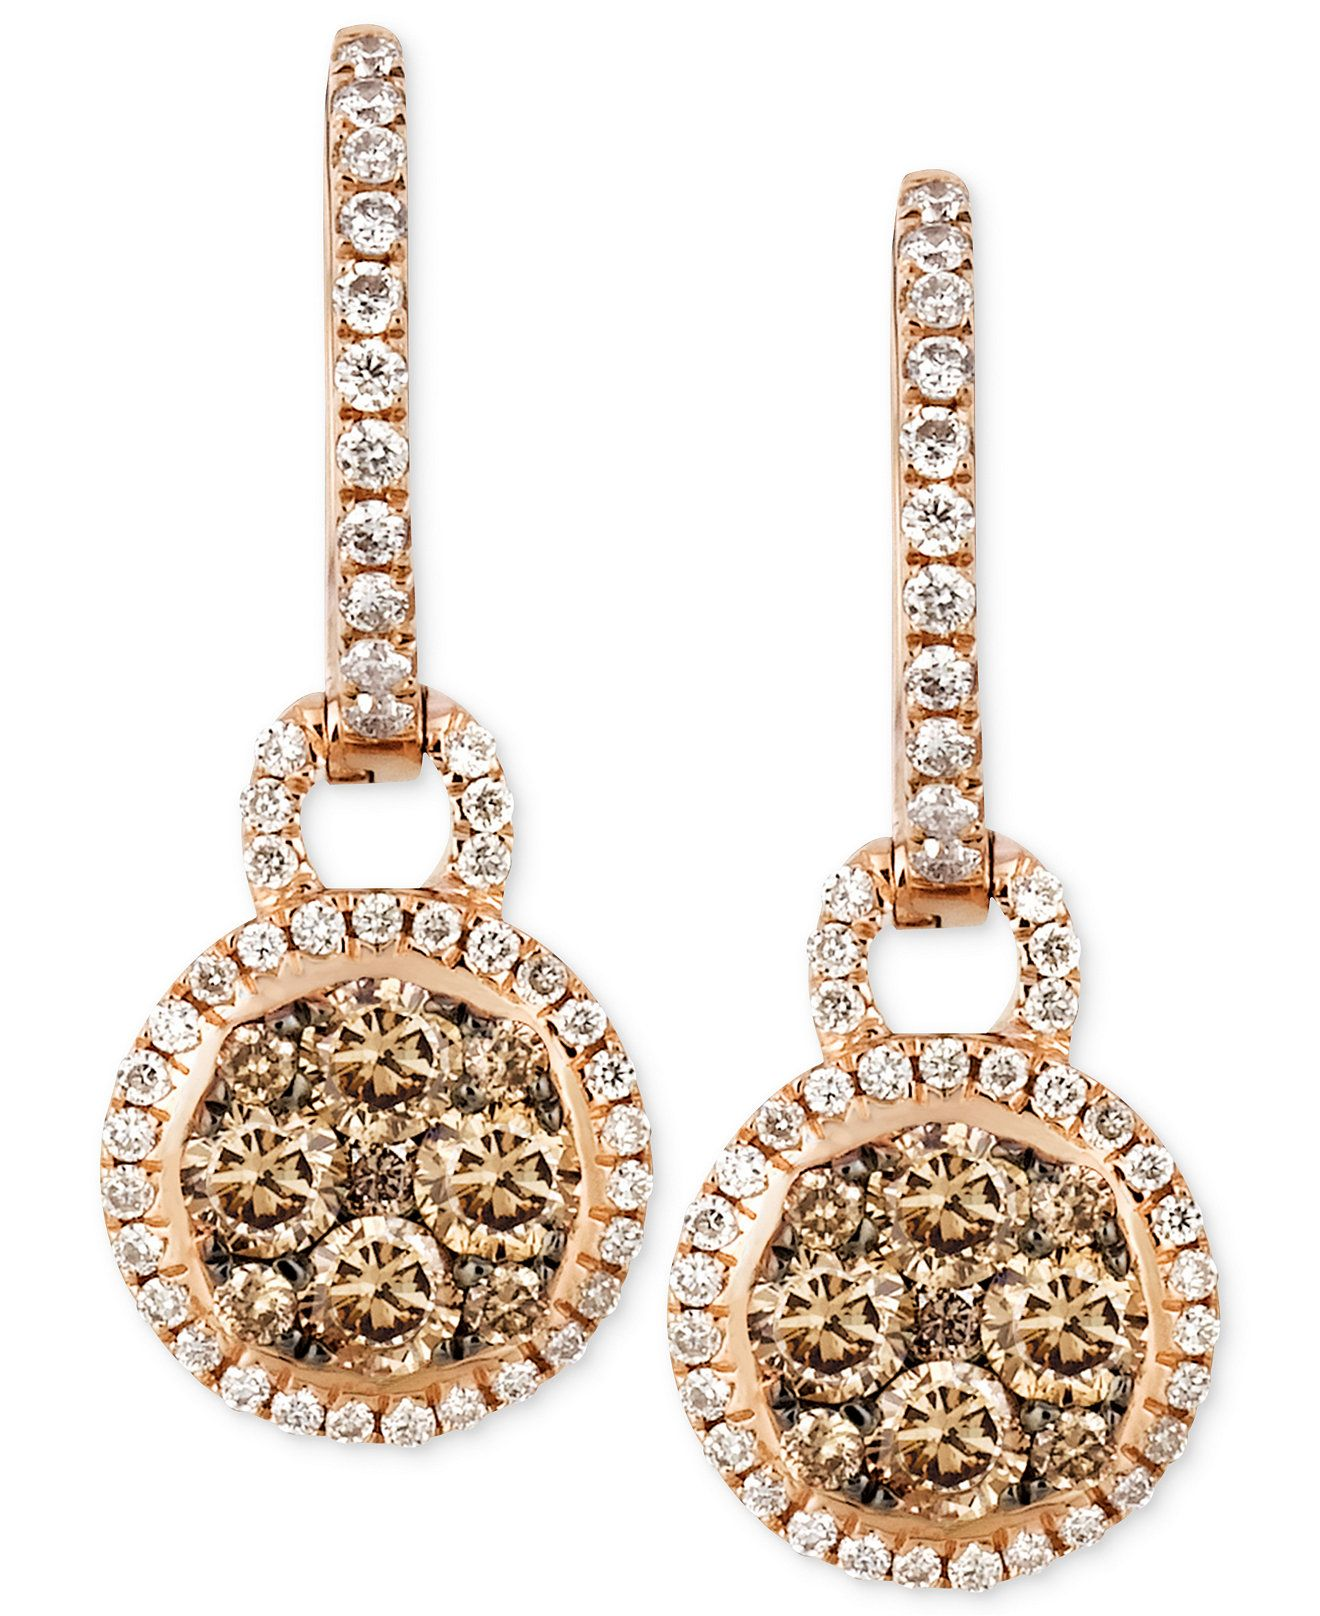 Le Vian Chocolate and White Diamond Circle Drop Earrings 1 ct tw